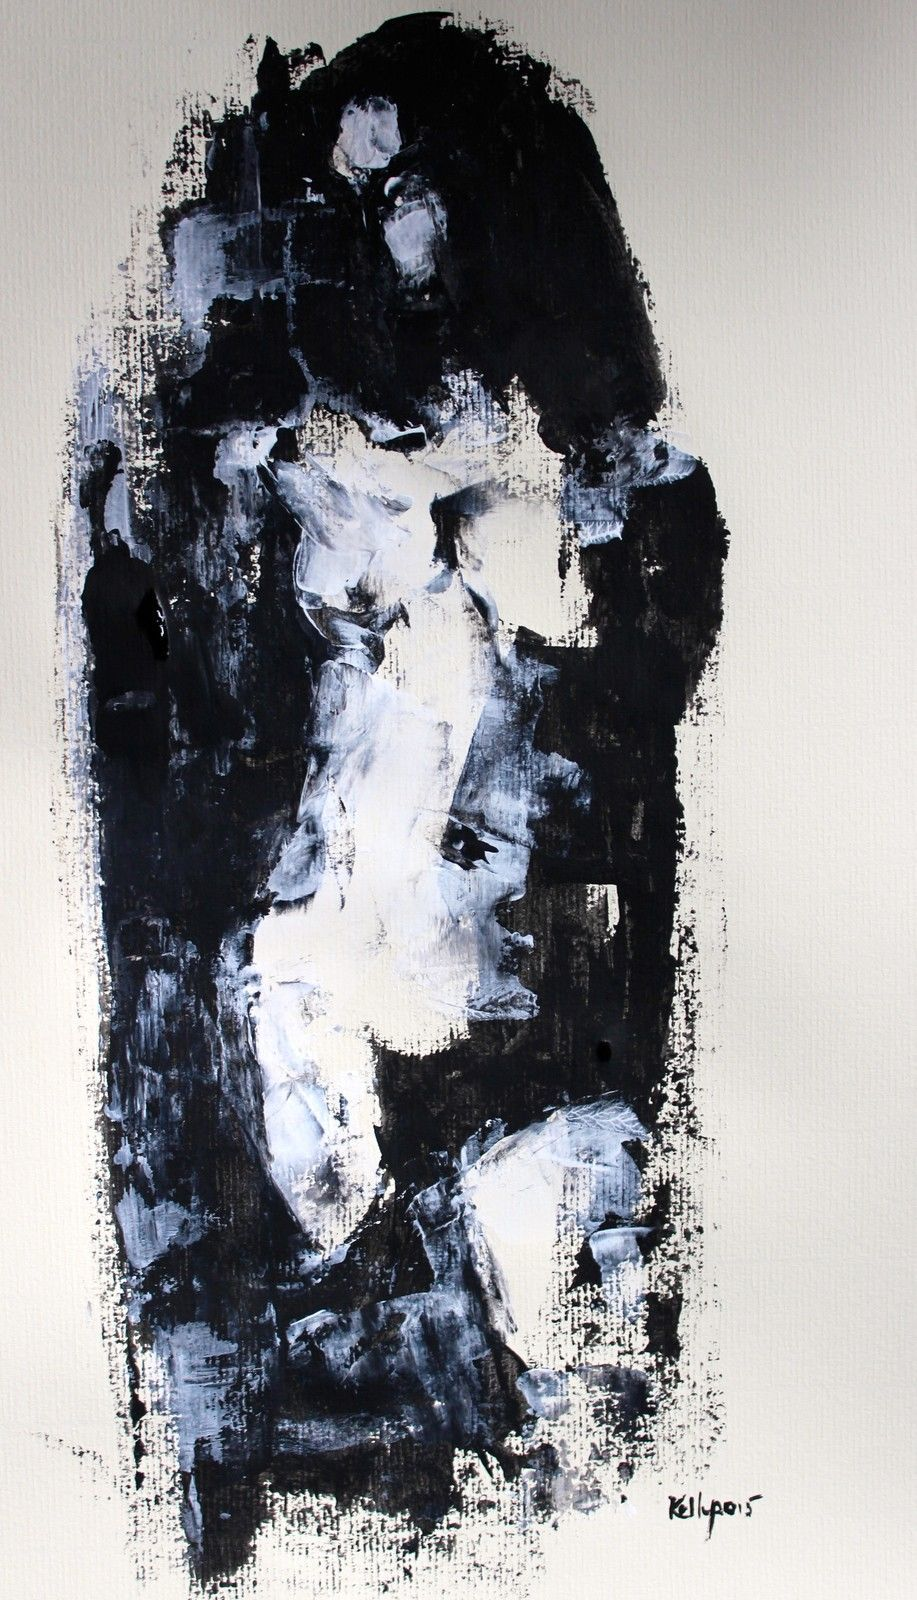 Emanuelle Cristaldi,Gary Lucy (born 1981) XXX images Tanya Garcia (b. 1981),Jennifer Freeman